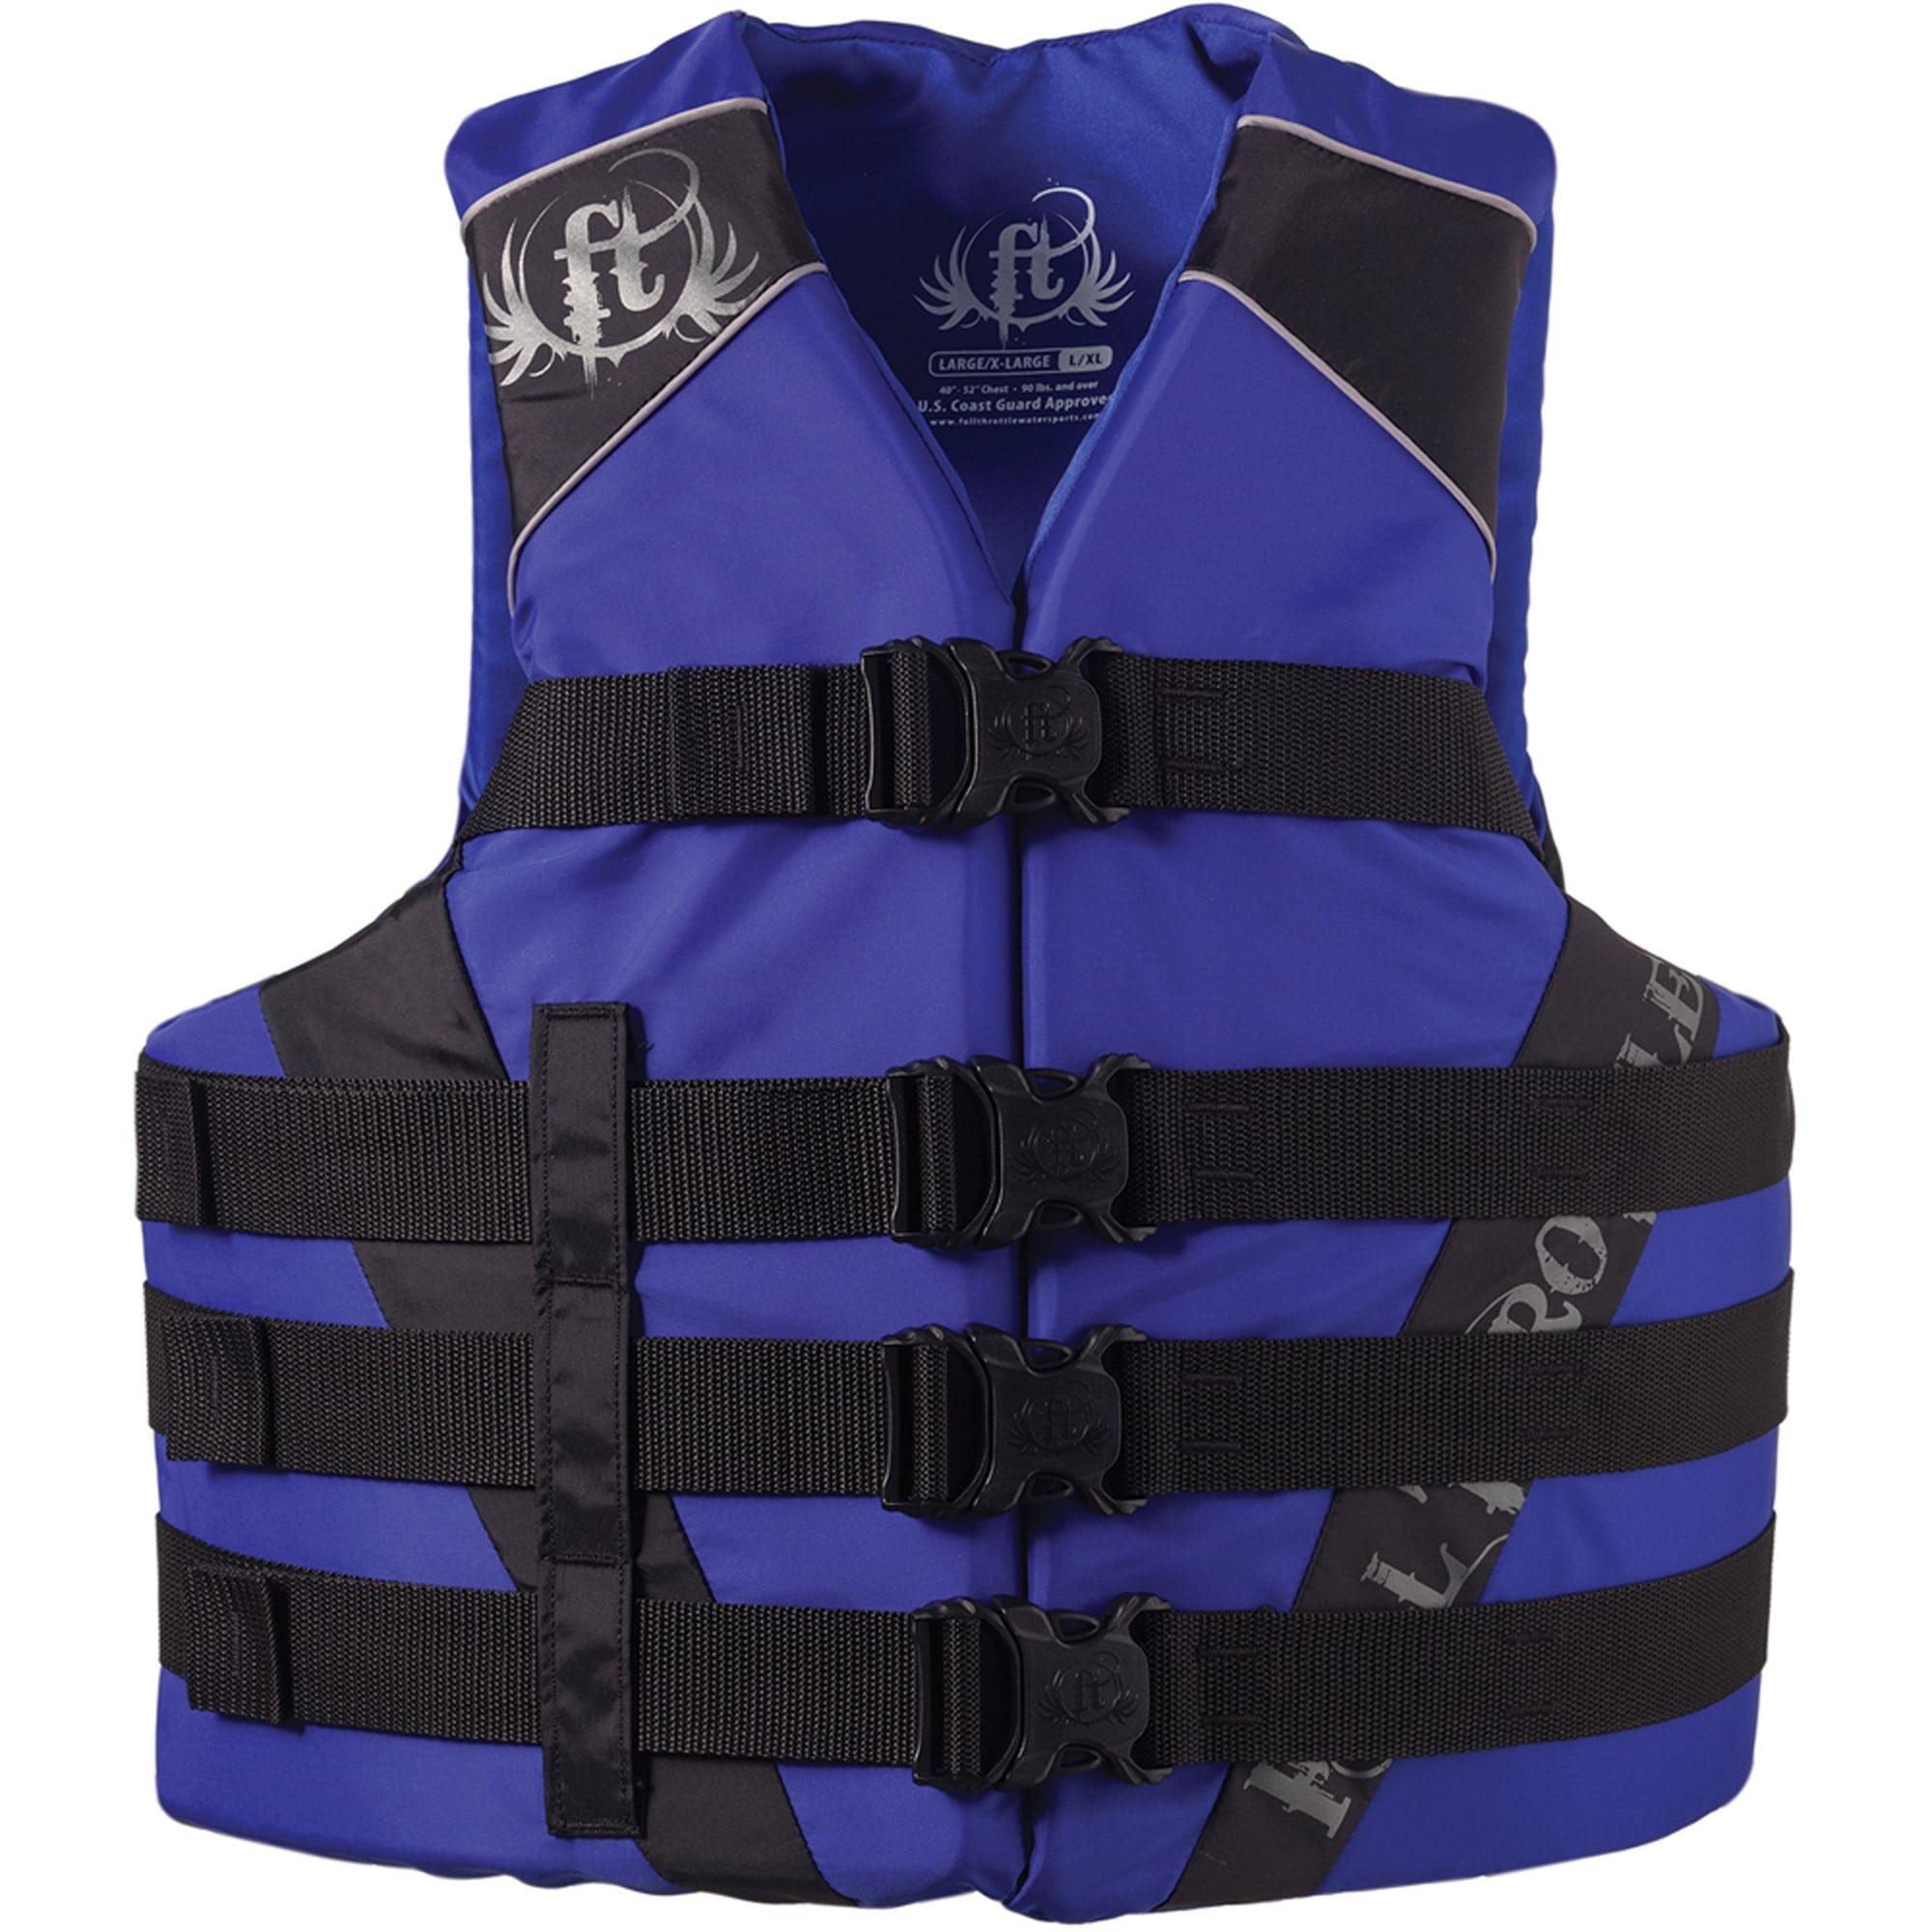 Full Throttle Adult Nylon Watersports Vest by Full Throttle